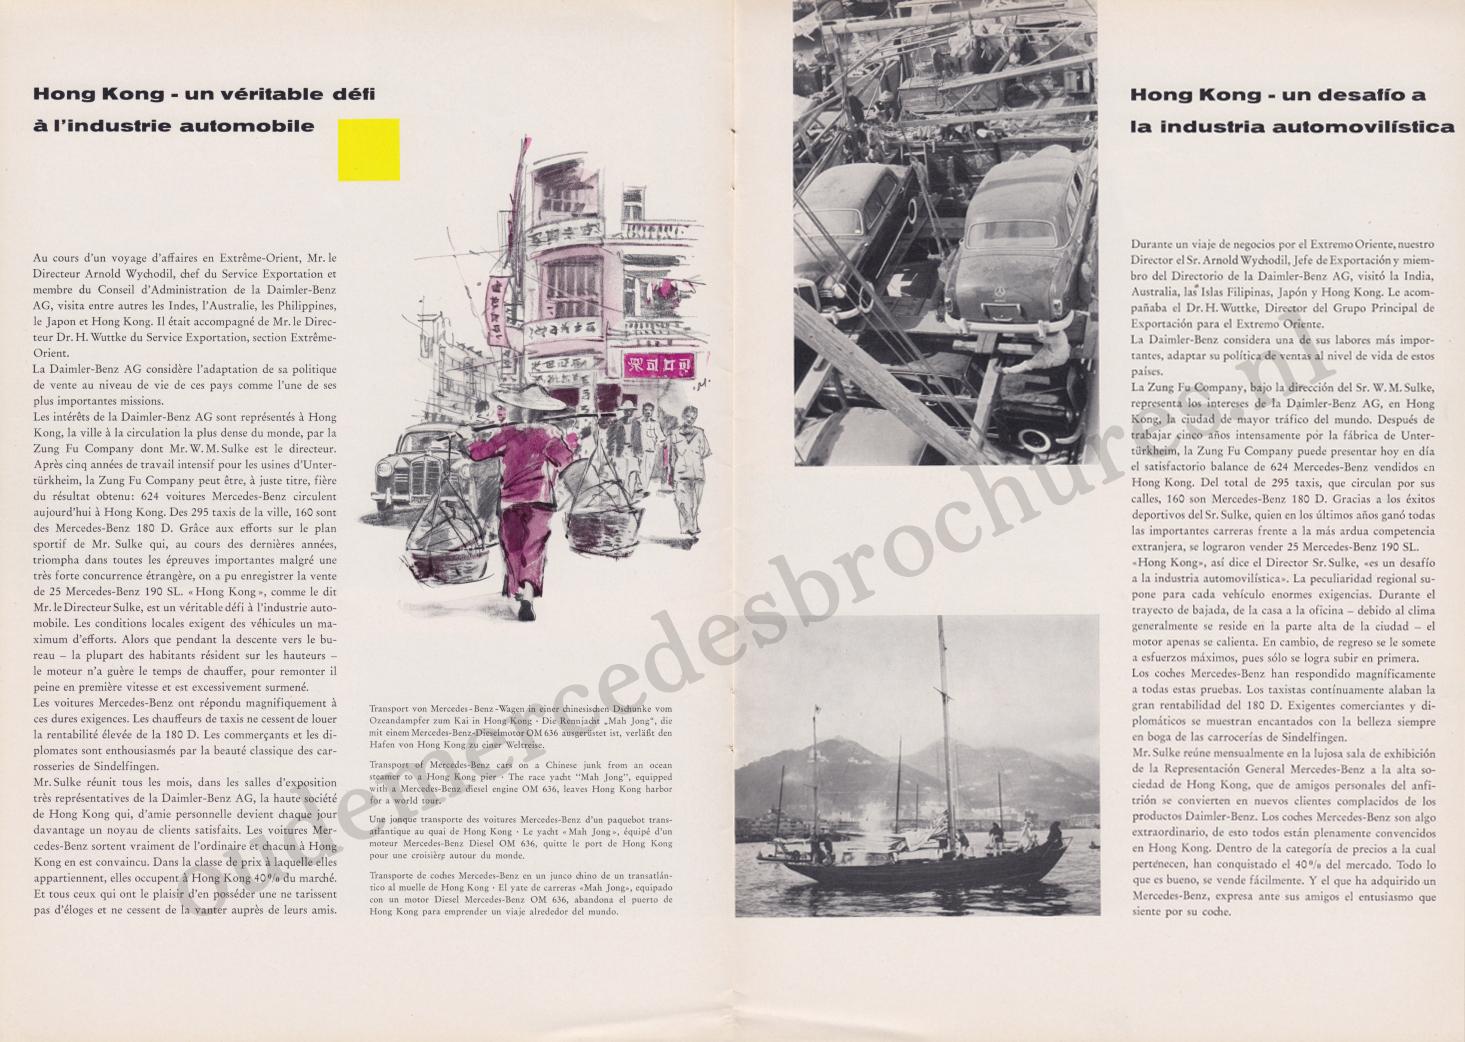 (REVISTA): Periódico In aller welt n.º 29 - Mercedes-Benz no mundo - 1959 - multilingue 005